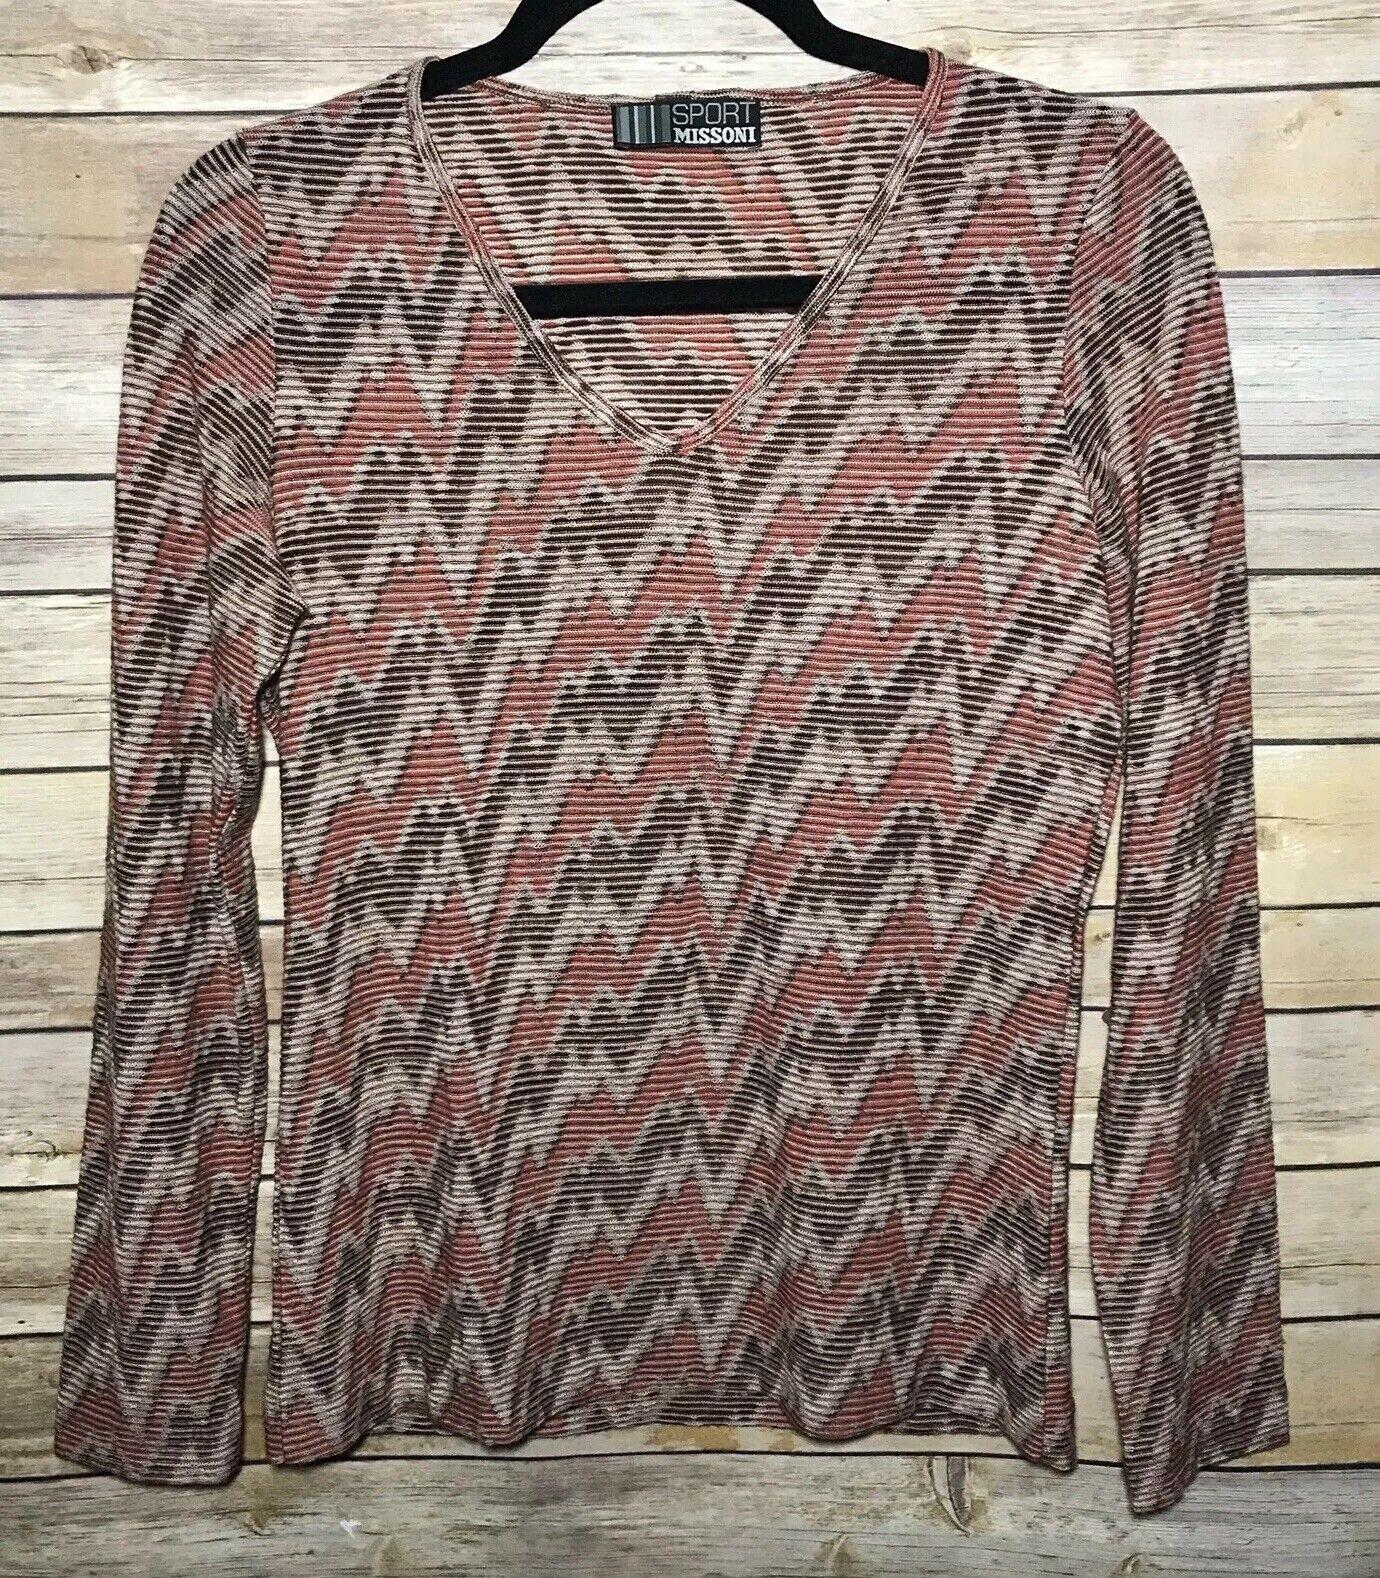 MISSONI damen Top L Multi Chevron Wool Sheer Knit Long Sleeve V Neck Zip Zag